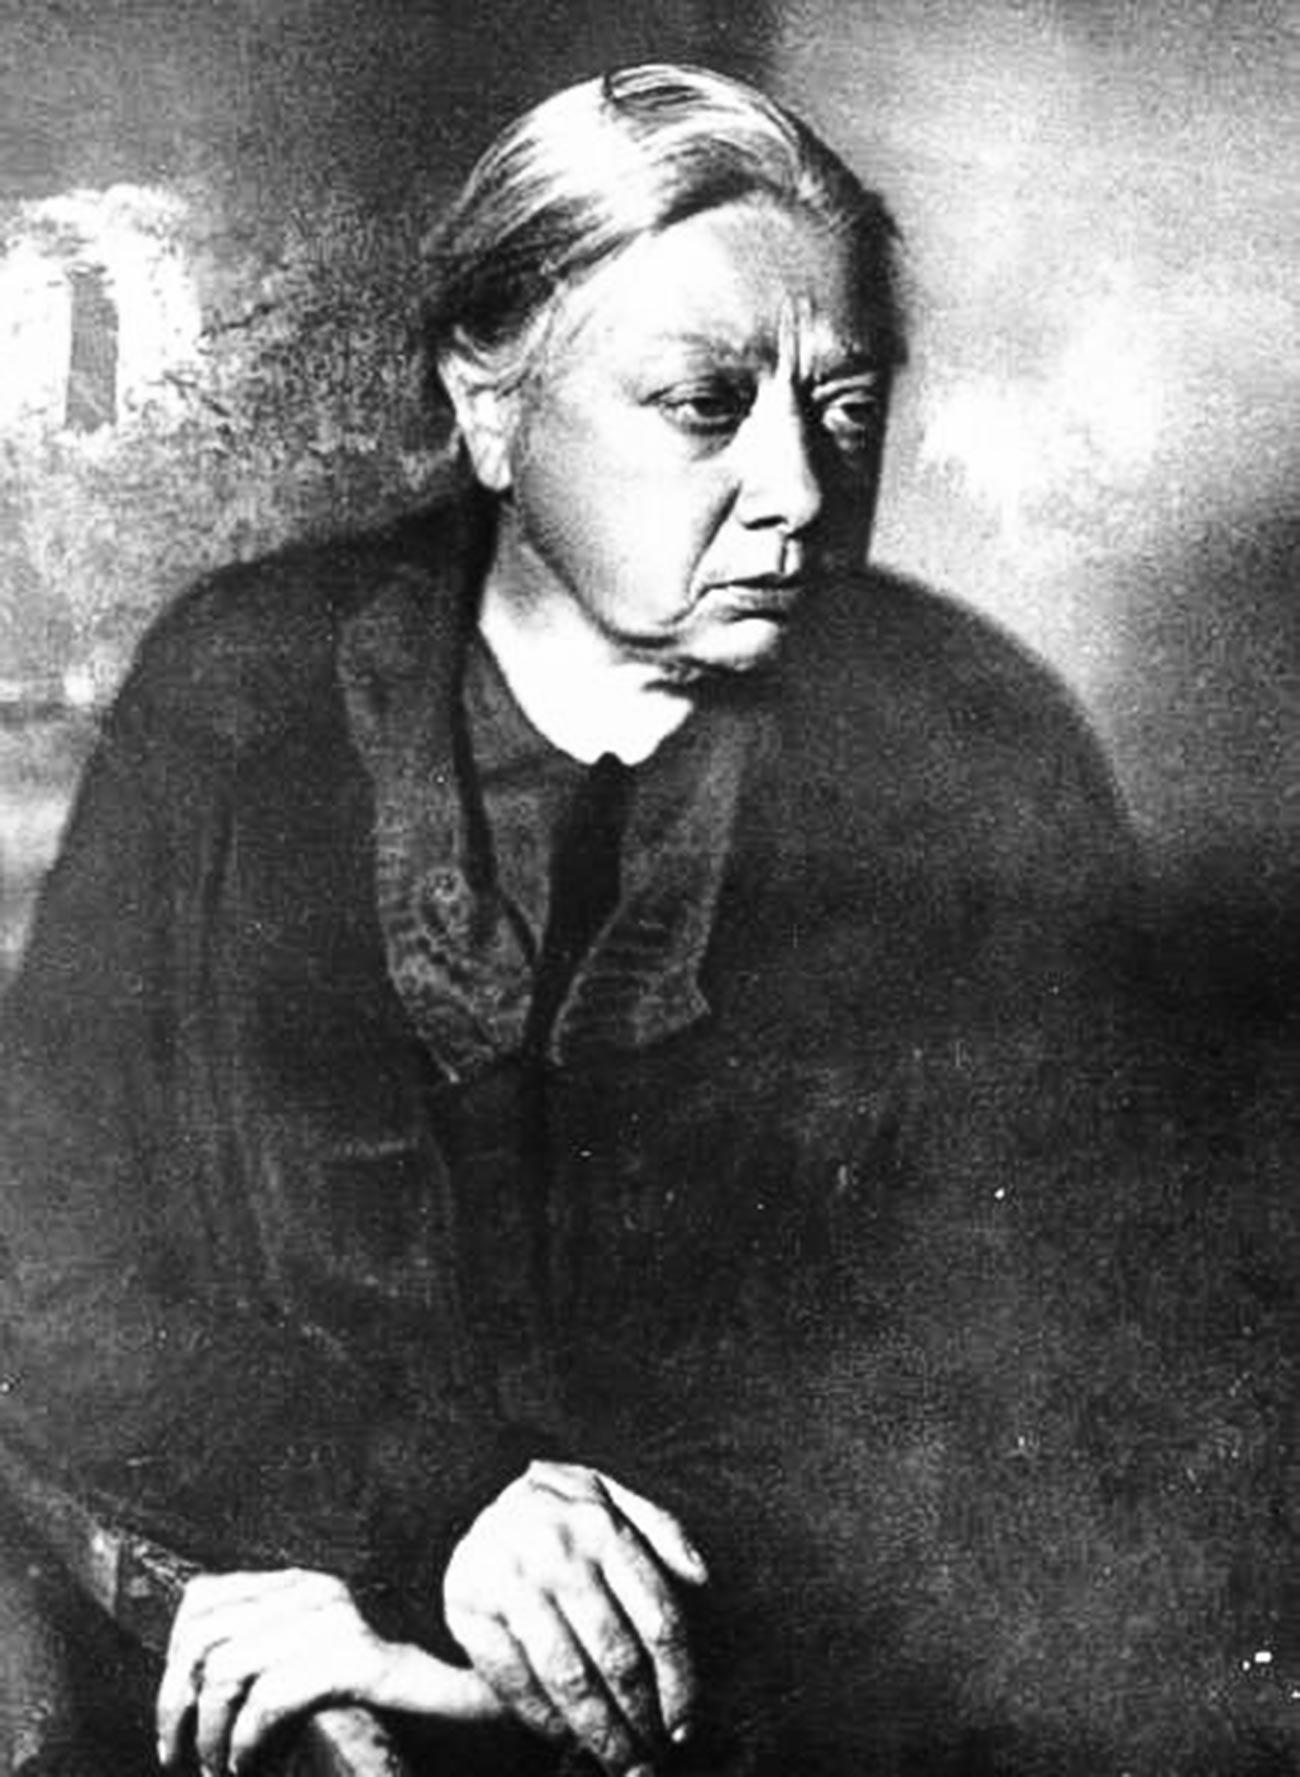 Lenin's wife and revolutionary, Nadezhda Krupskaya, 1932